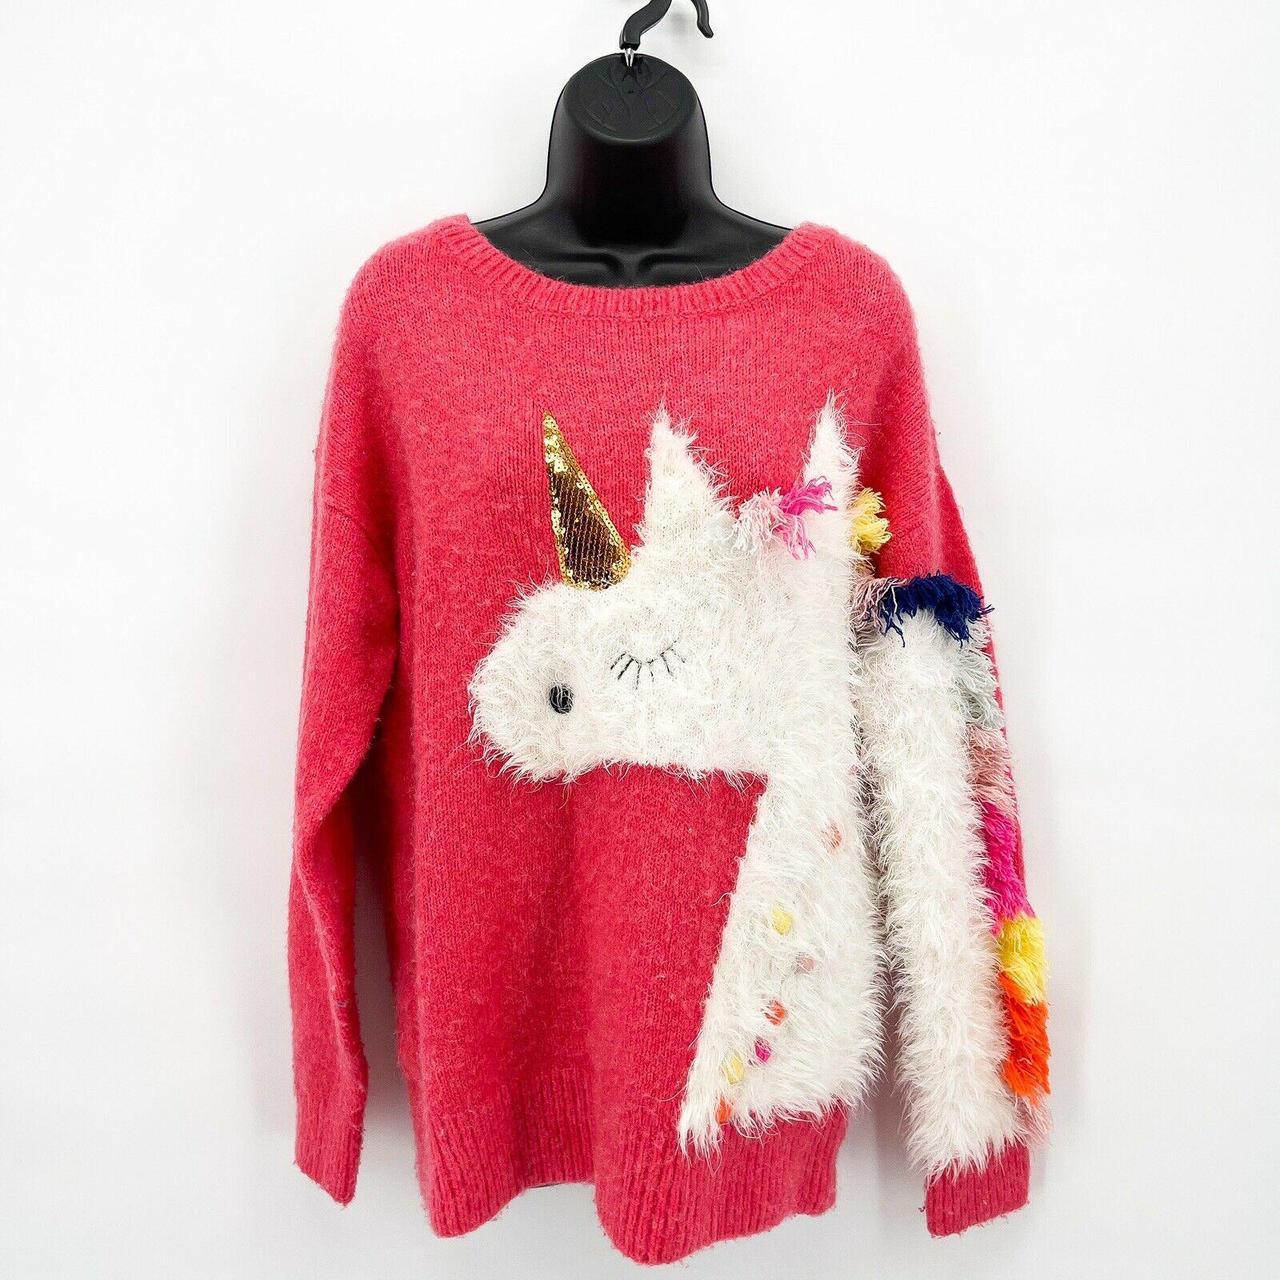 Product Image 1 - NEXT Knitwear Women's Pink Wool